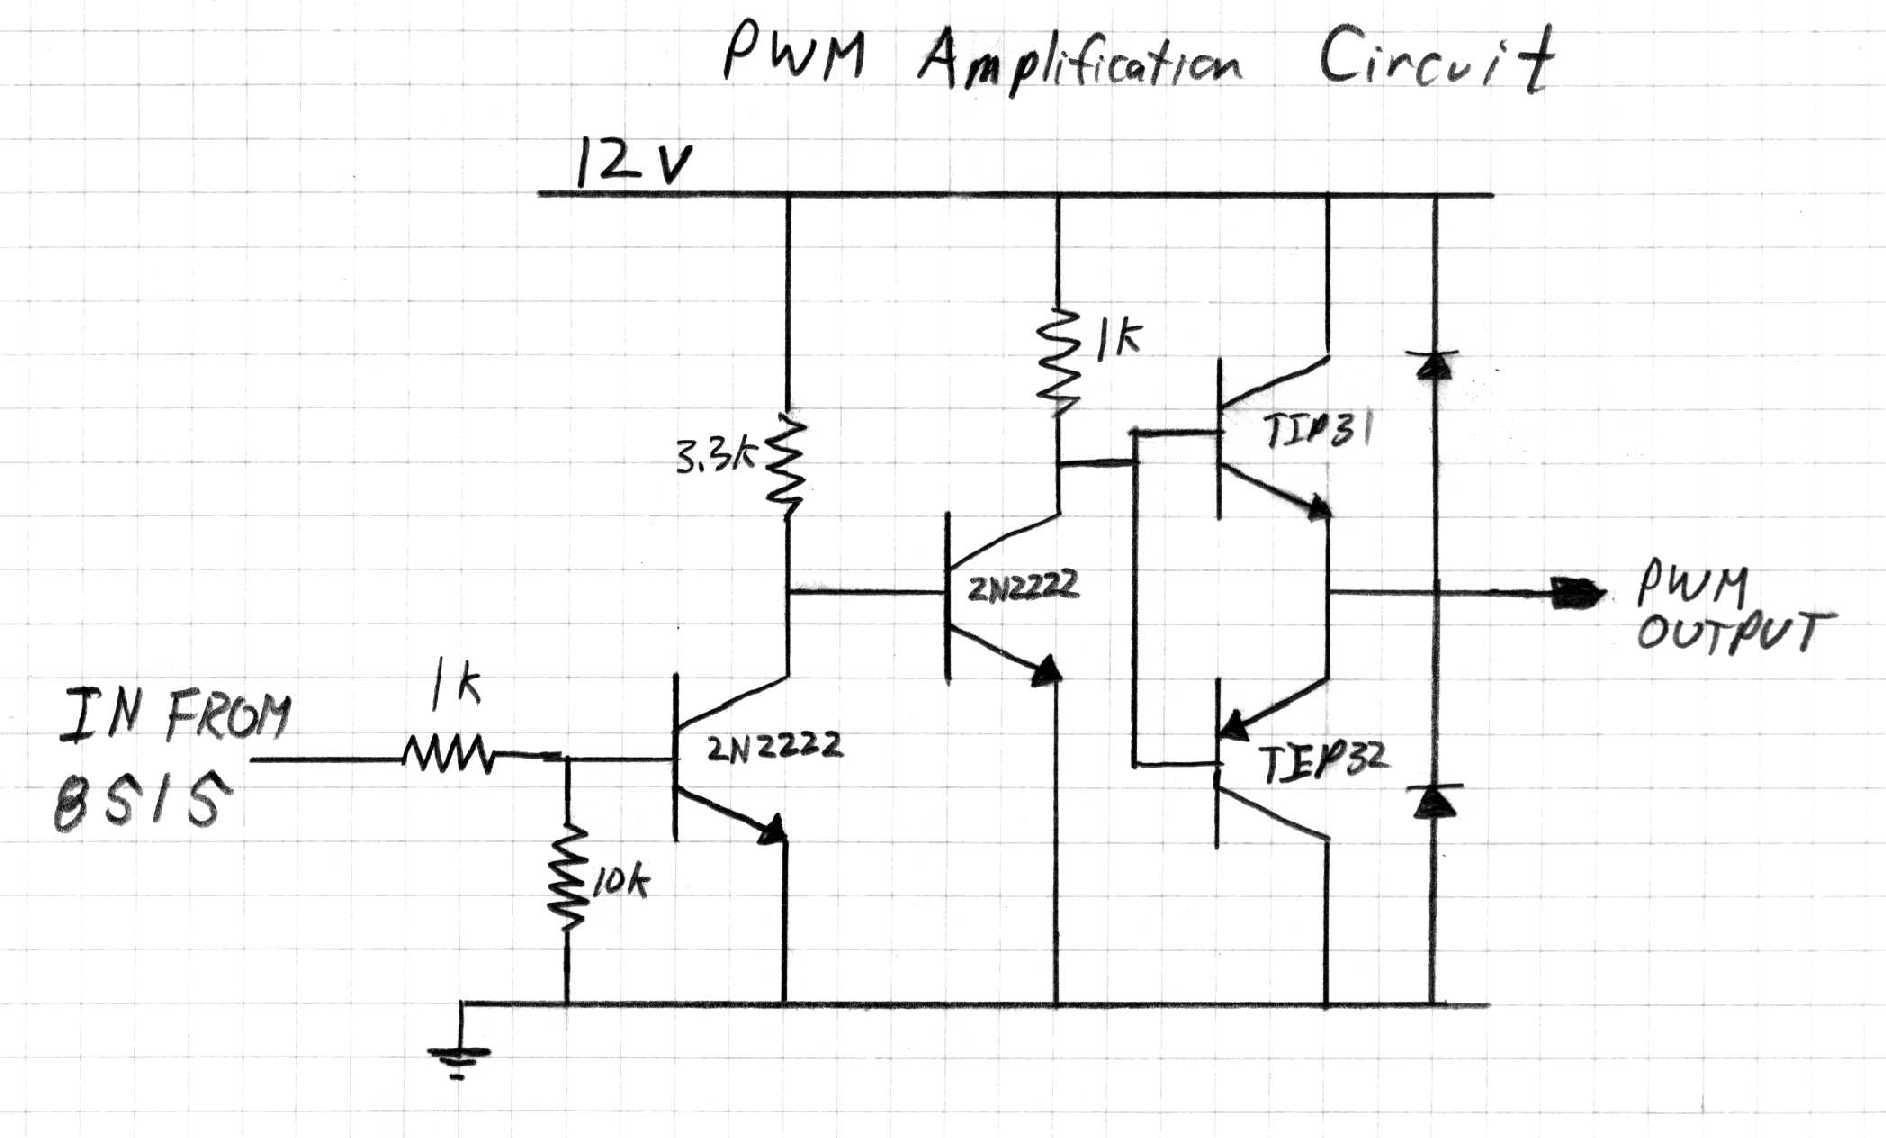 pwm circuit schematic